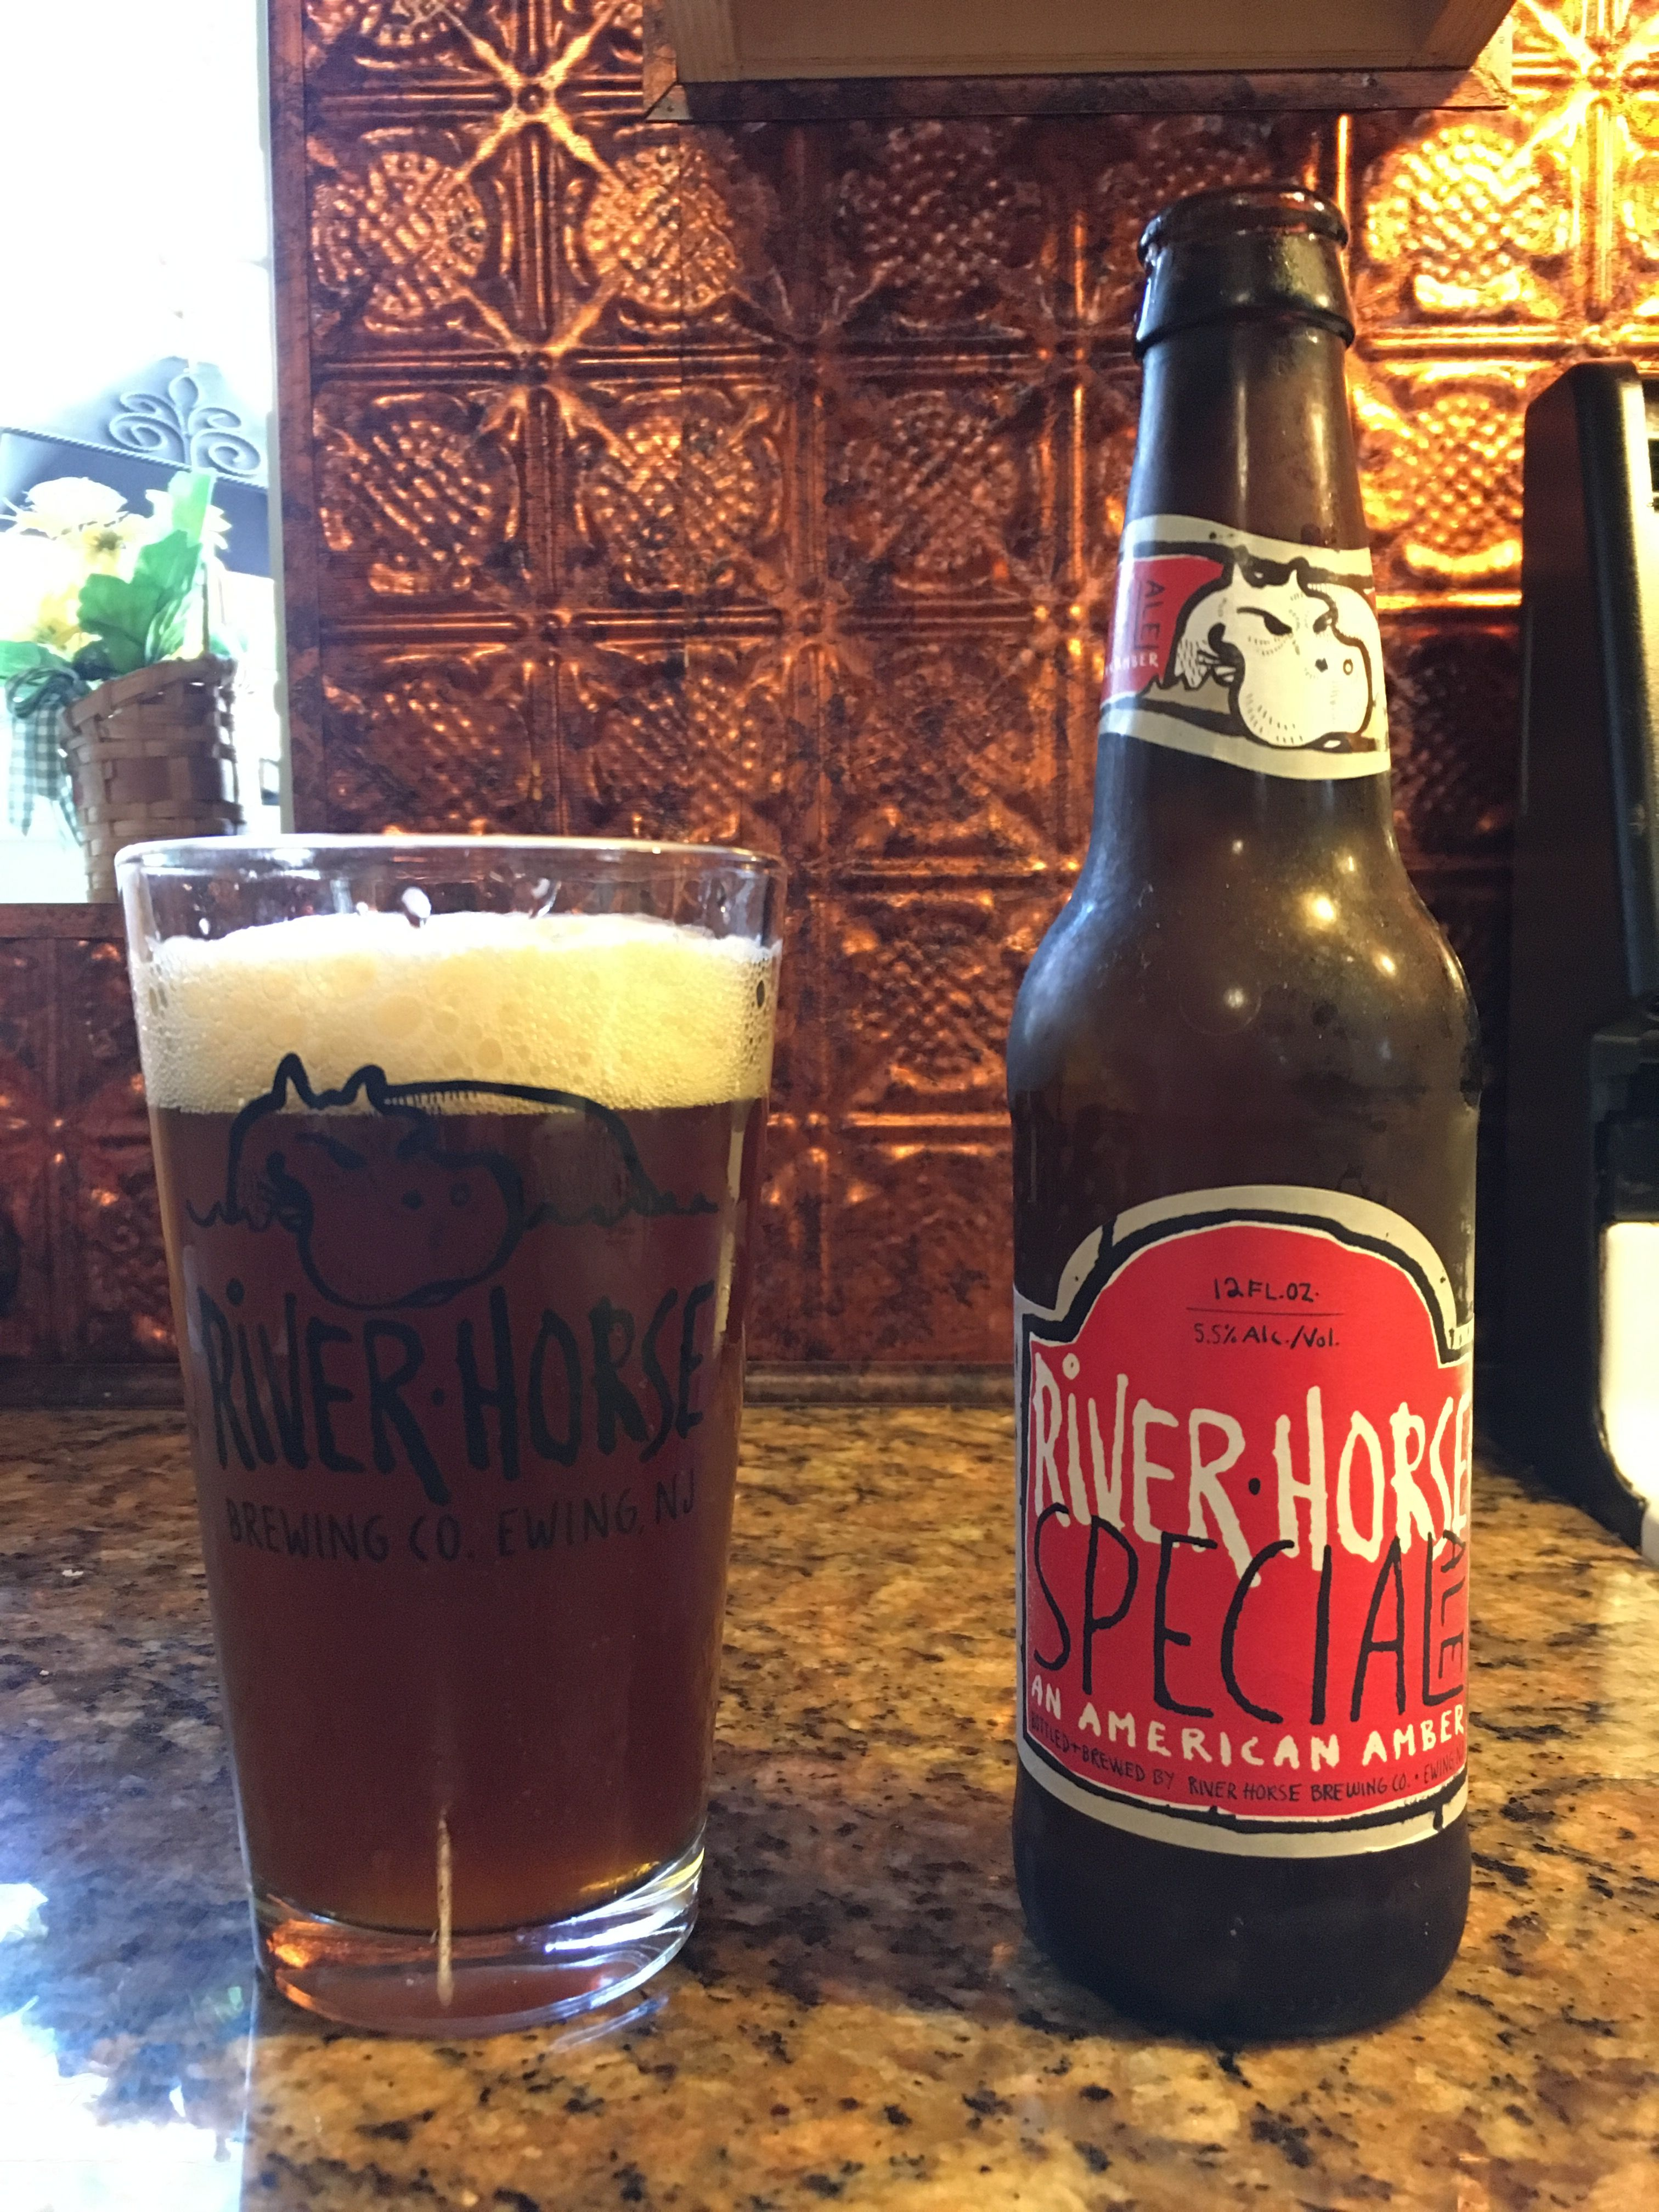 Special Ale By River Horse Brewery Ewing Nj Beer Dark Beer Brewery